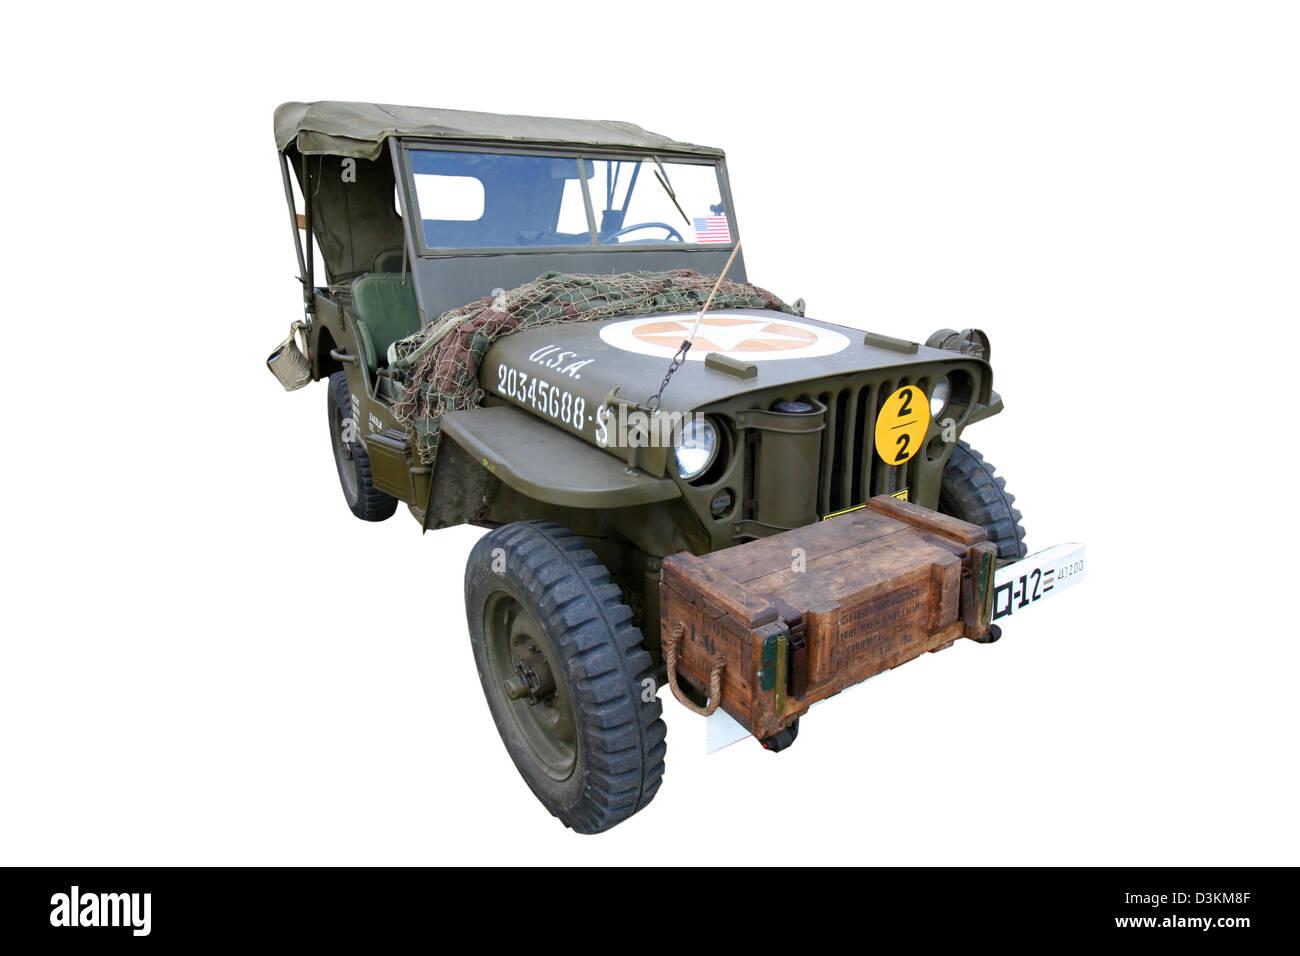 World War II US Army - Stock Image